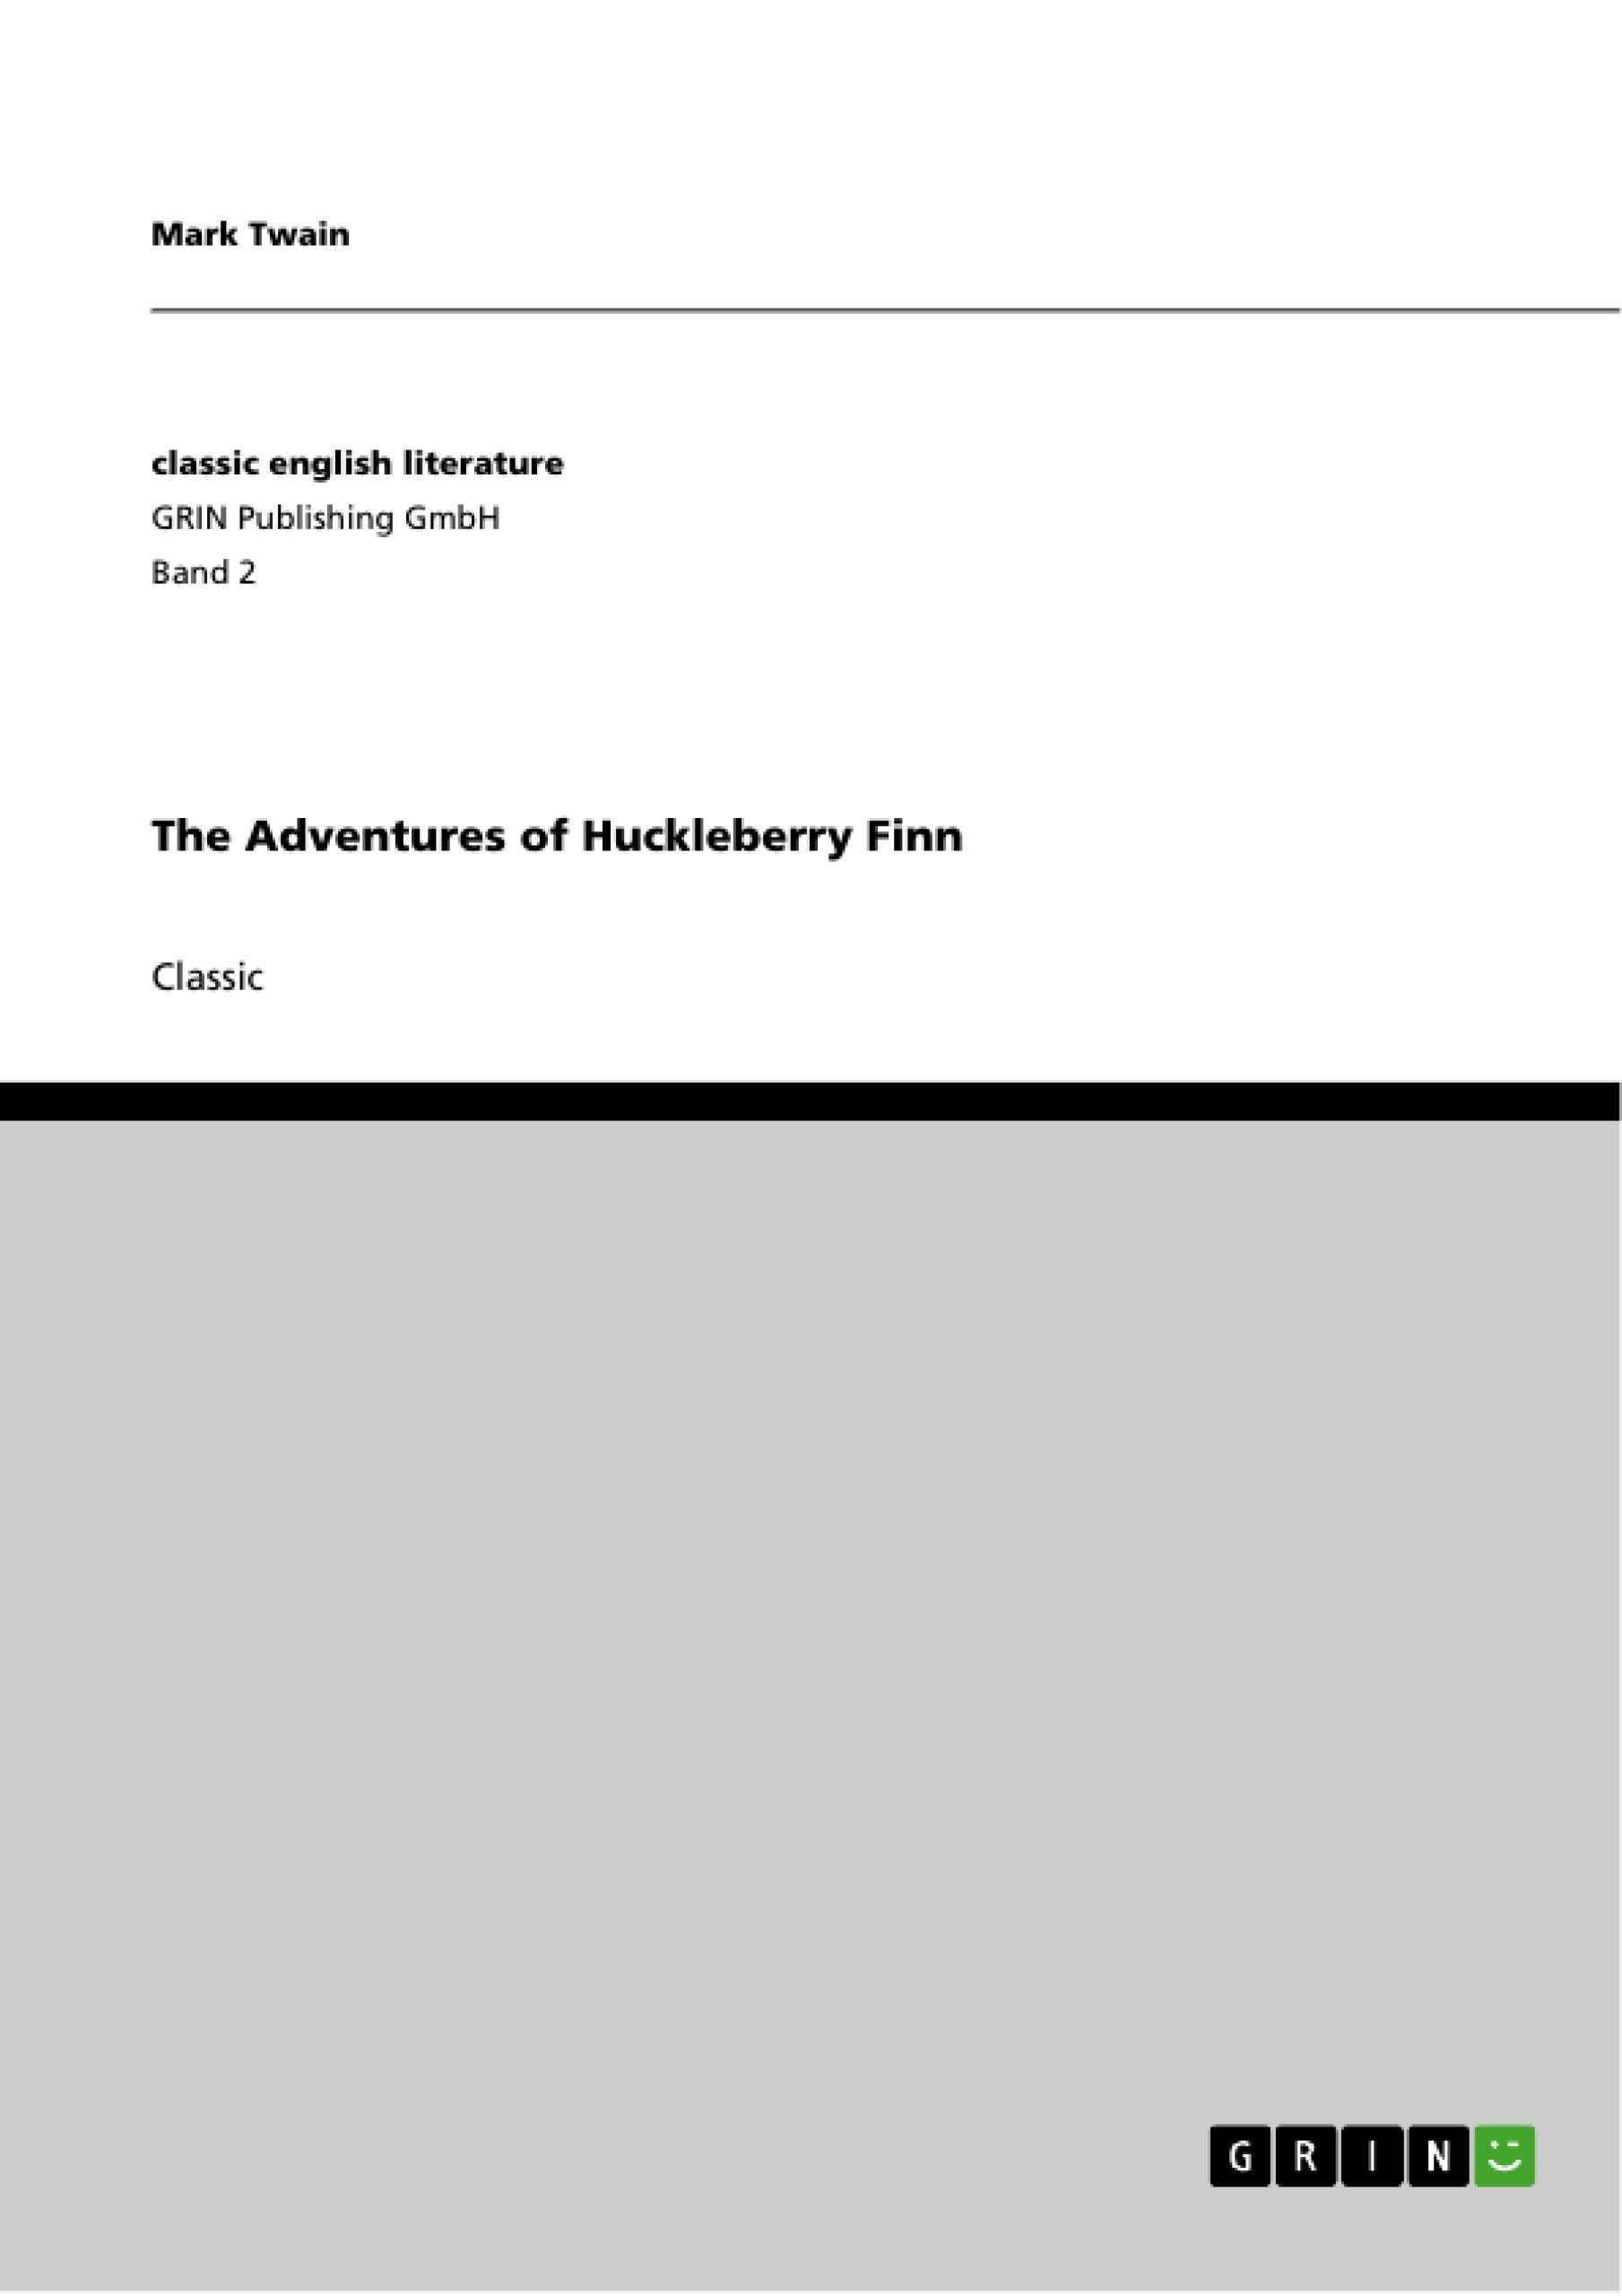 Title: The Adventures of Huckleberry Finn